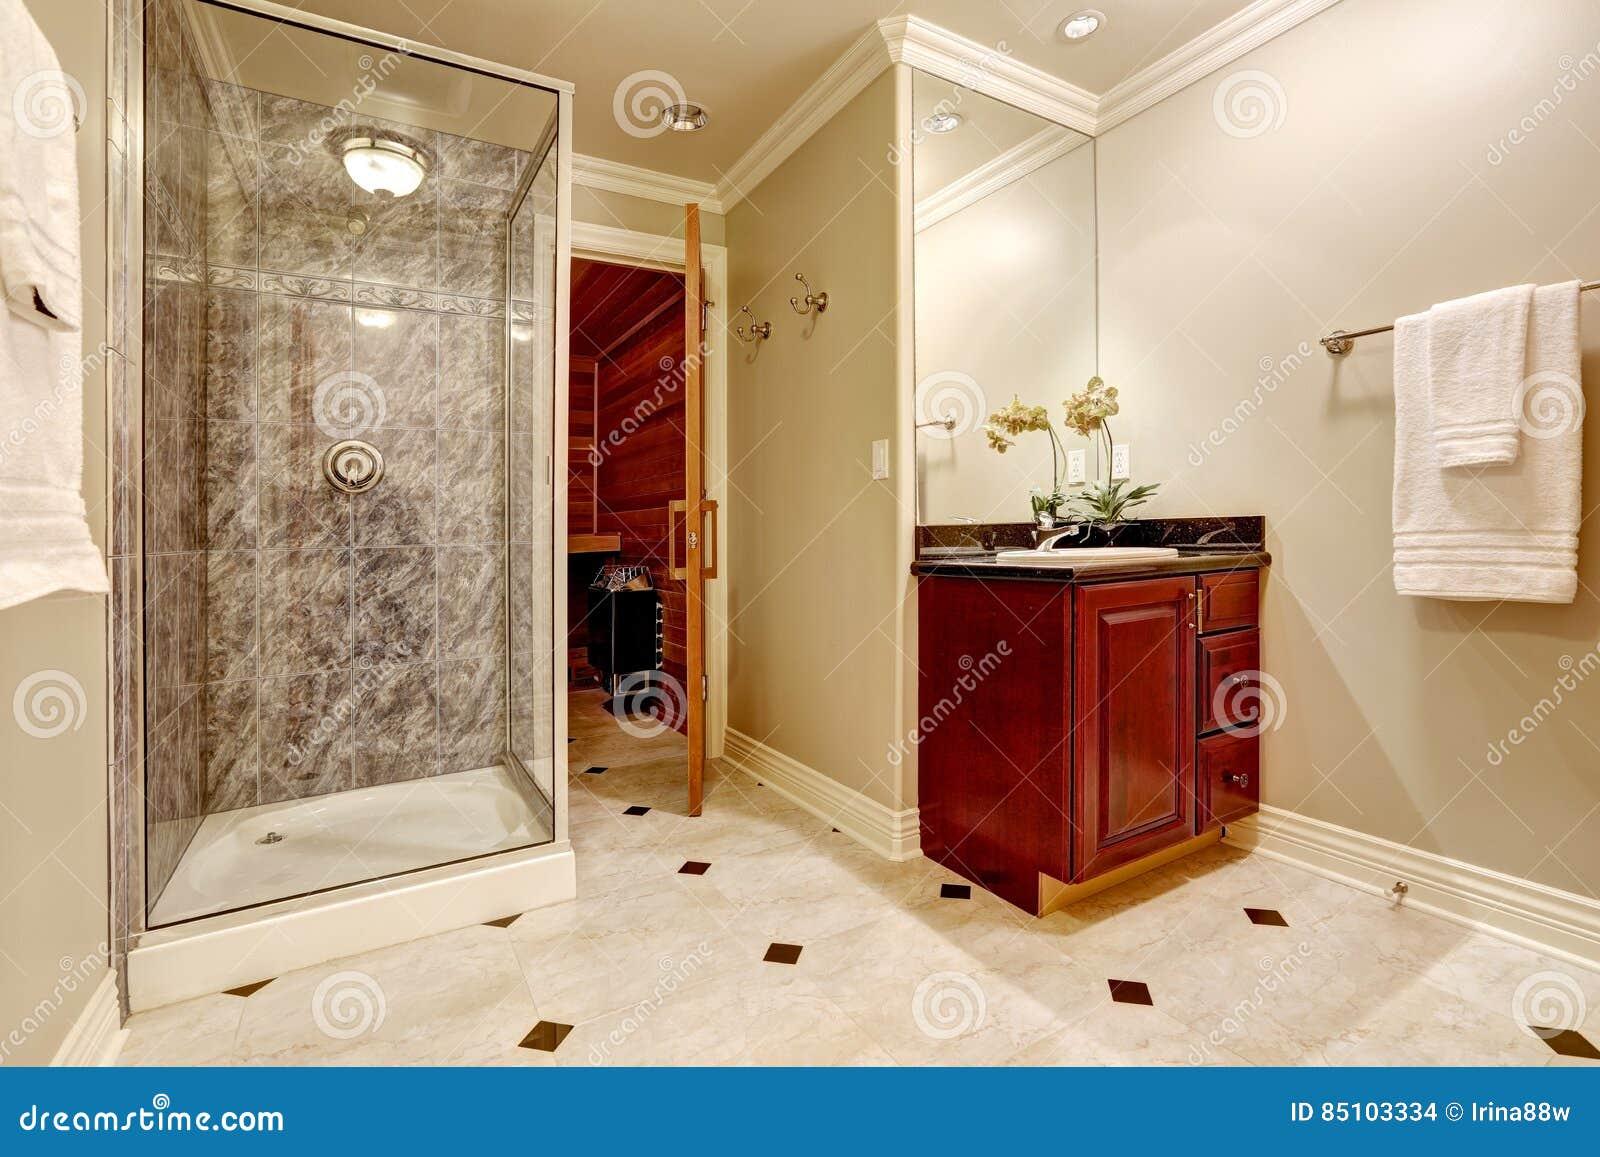 Luxurious Bathroom Interior Design With Sauna